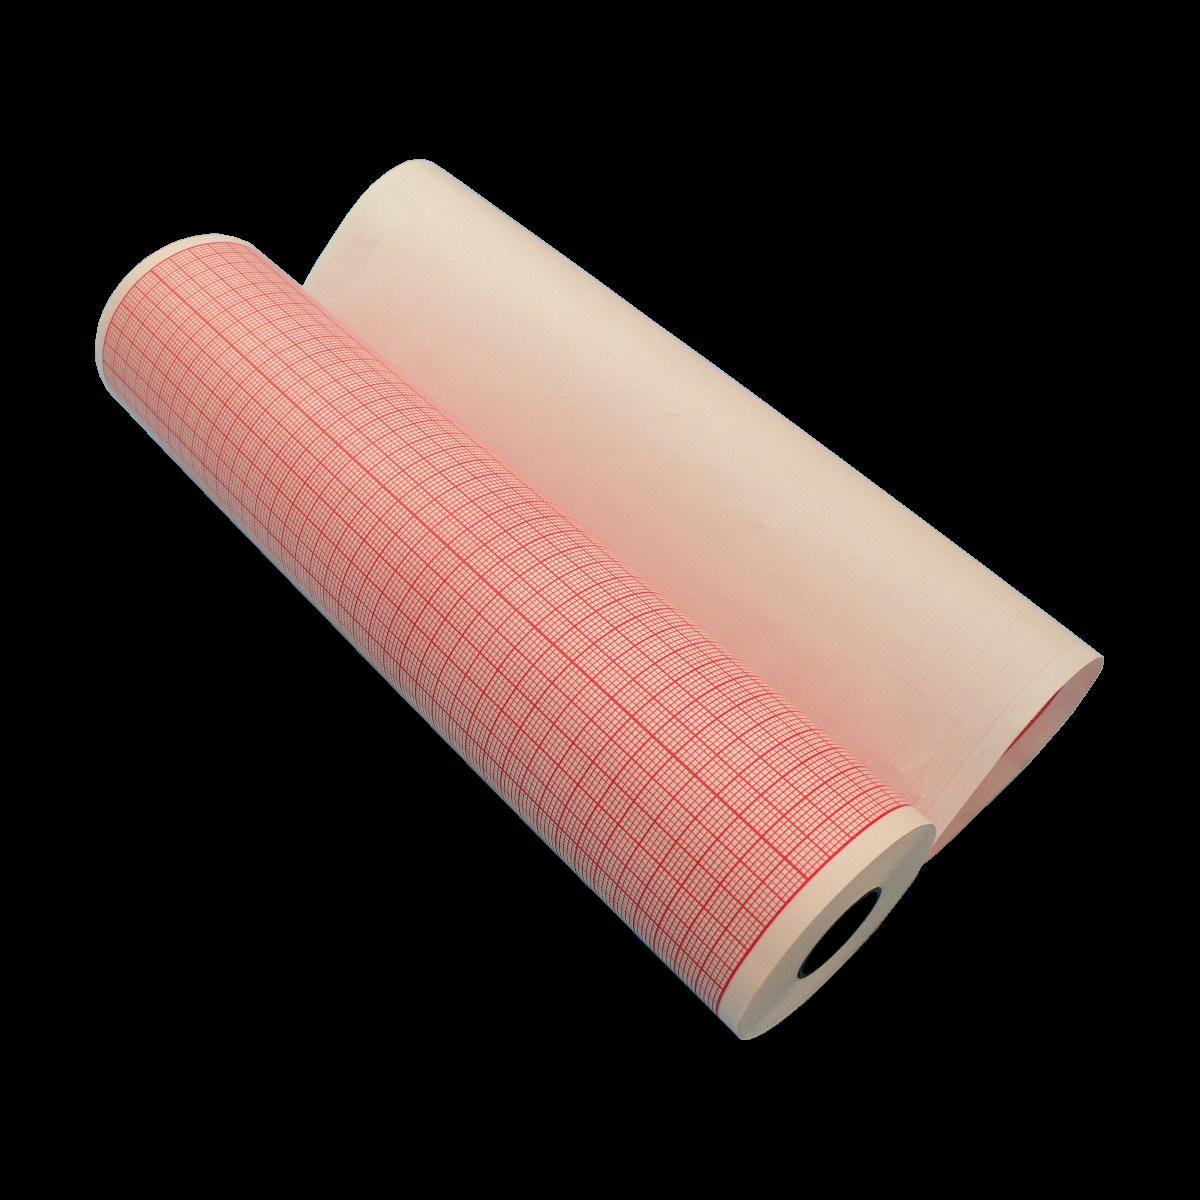 210х25х18, бумага ЭКГ для электрокардиографа, реестр 4063/3